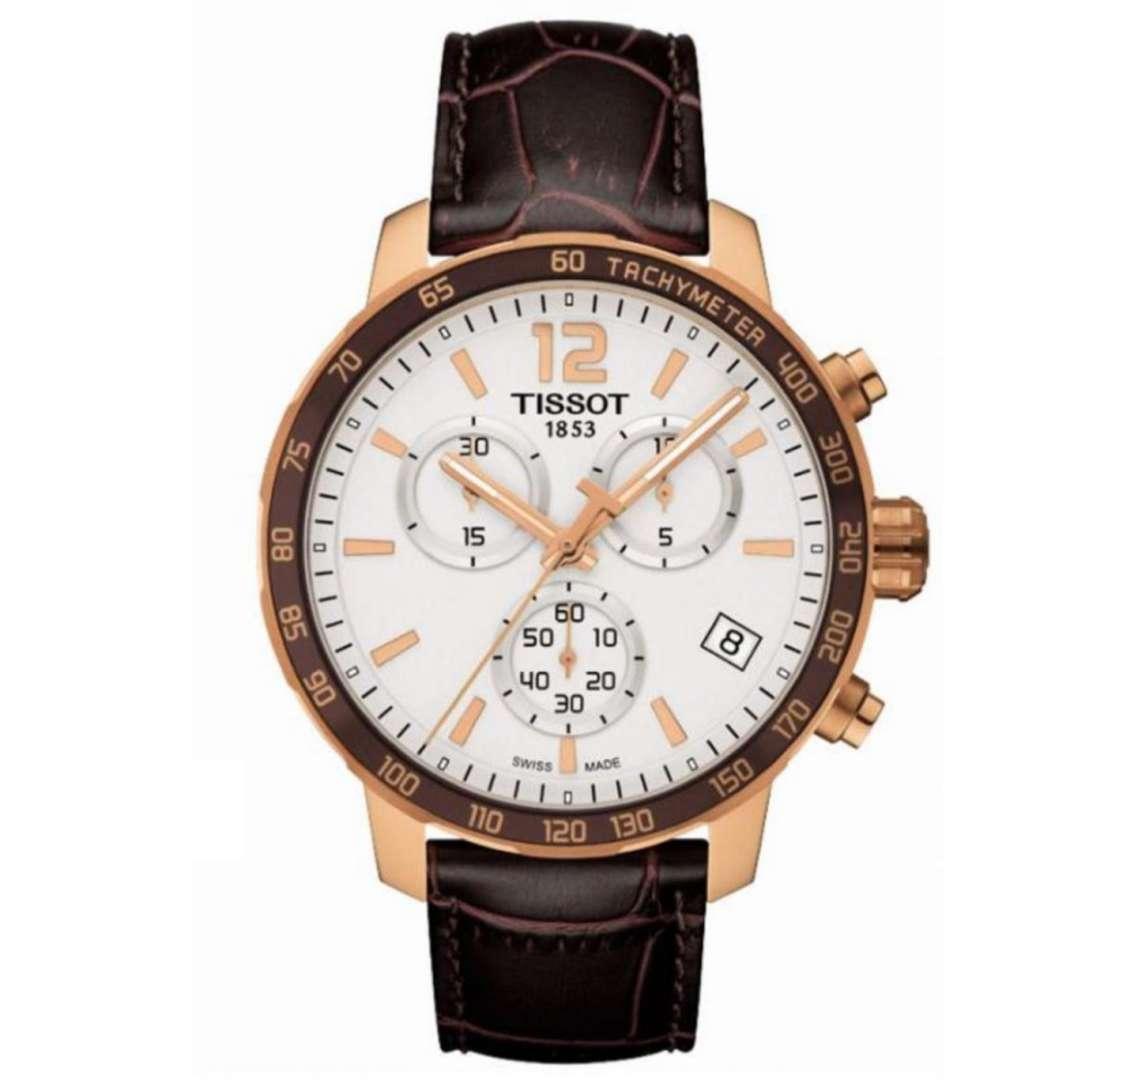 שעון יד אנלוגי tissot t095.417.36.037.00 טיסו